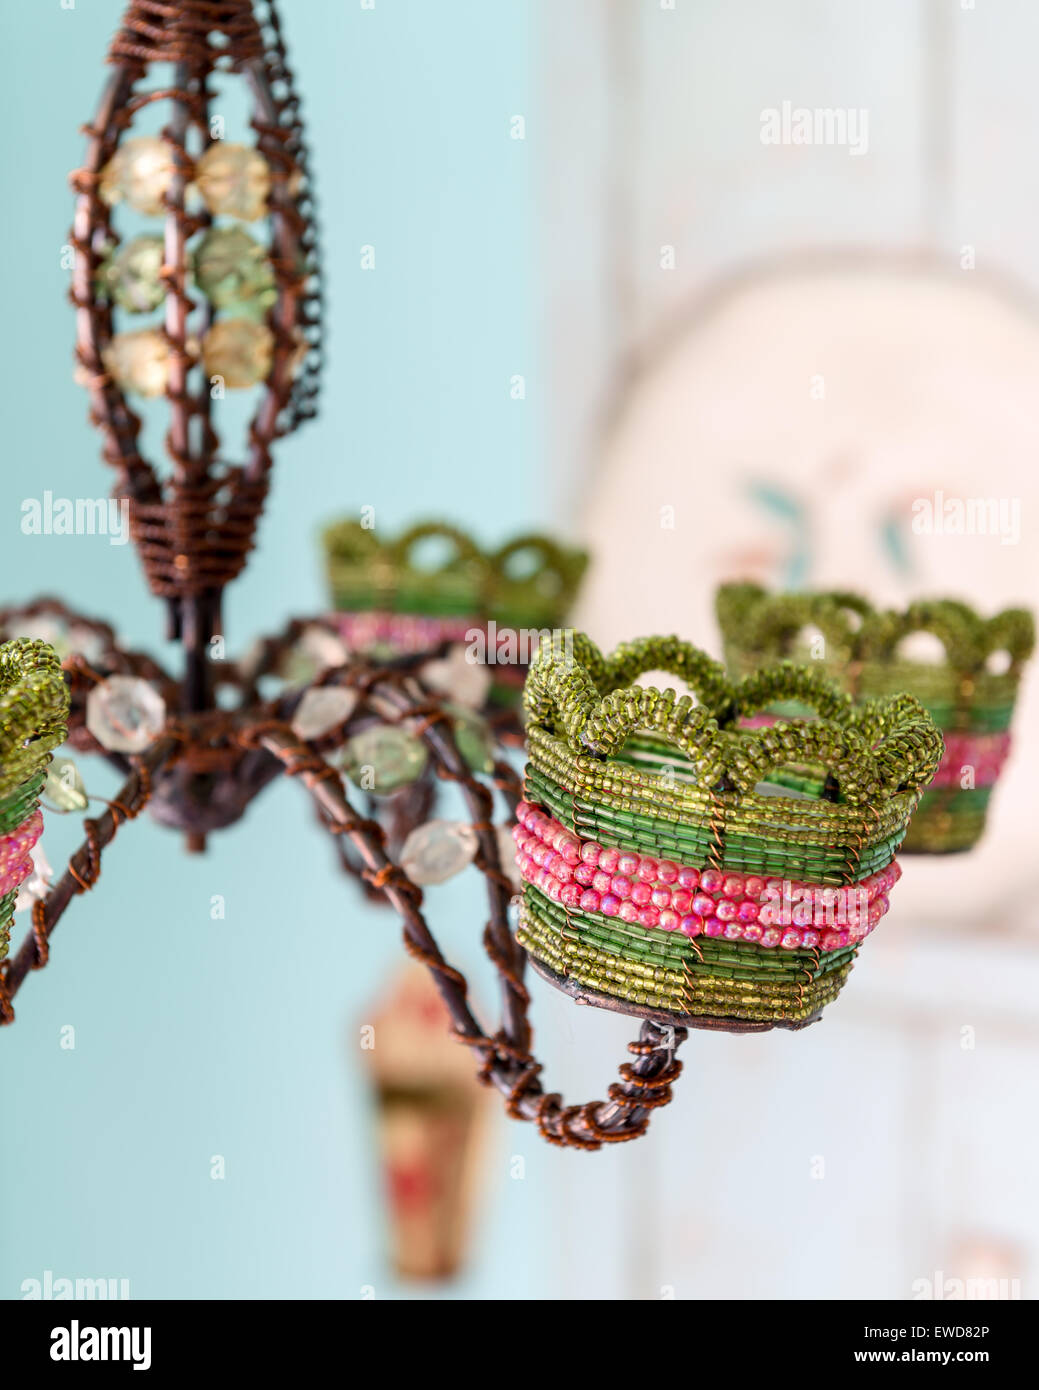 Detail of beaded chandelier - Stock Image